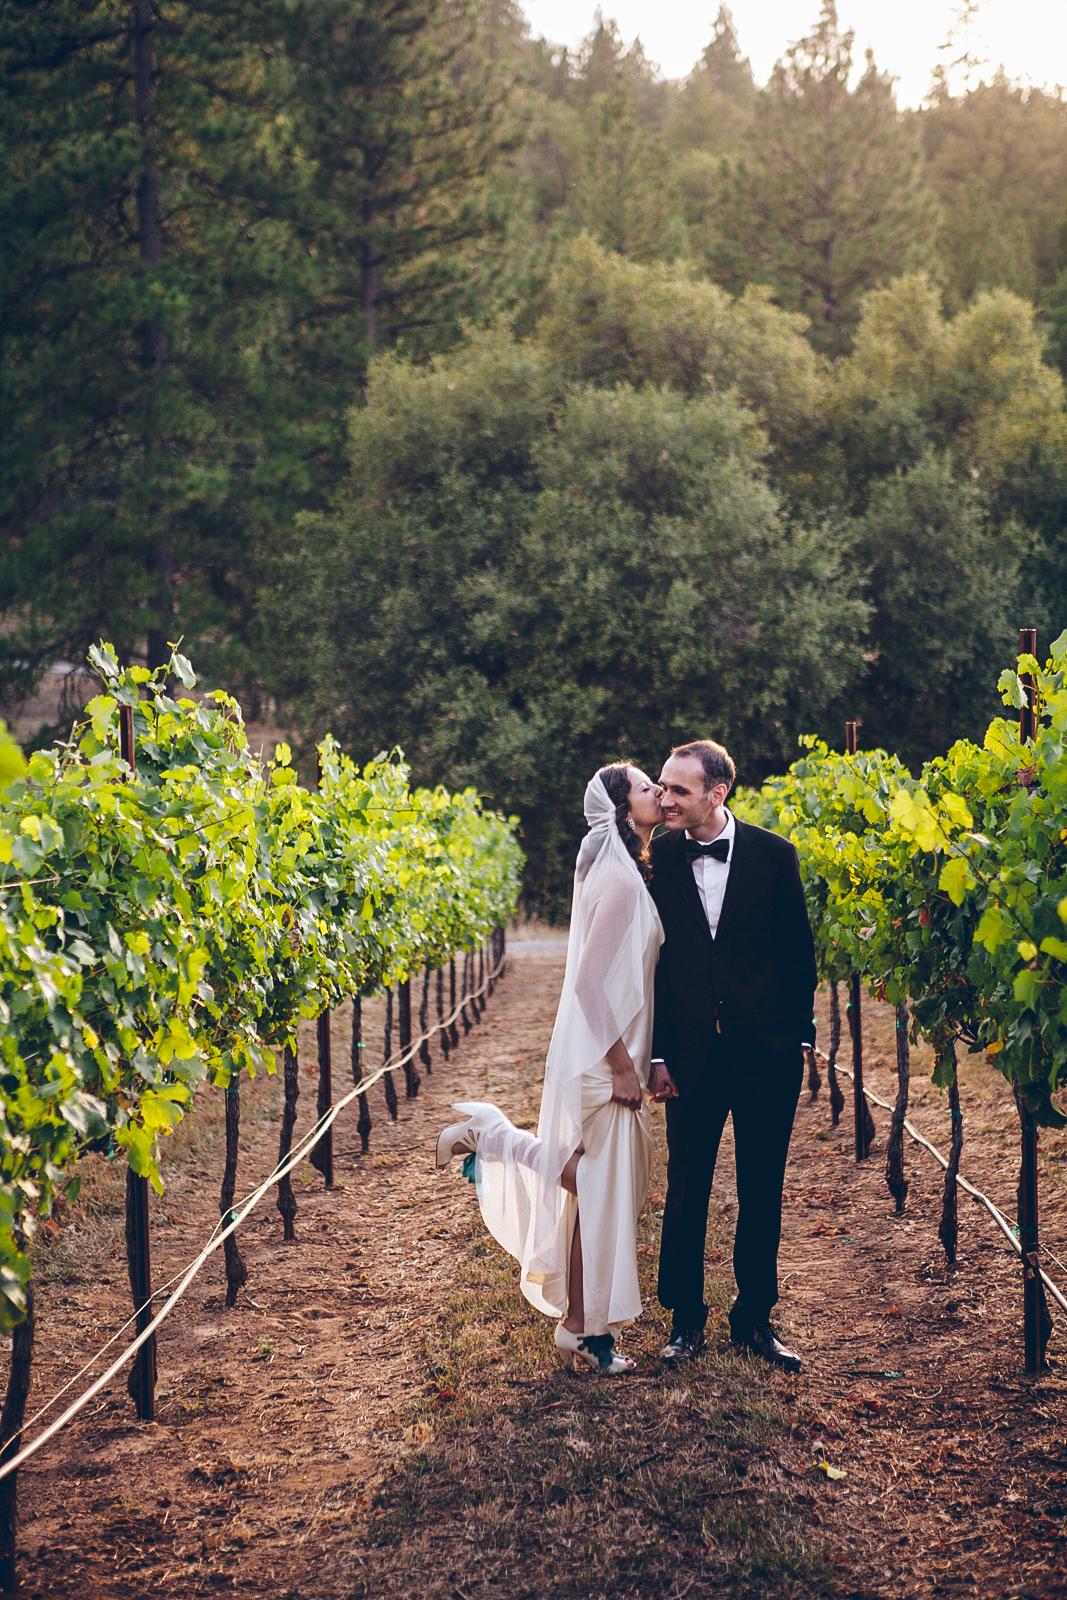 miraflores_winery_wedding_photography_ian_melissa_ebony_siovhan_bokeh_photography_54.jpg